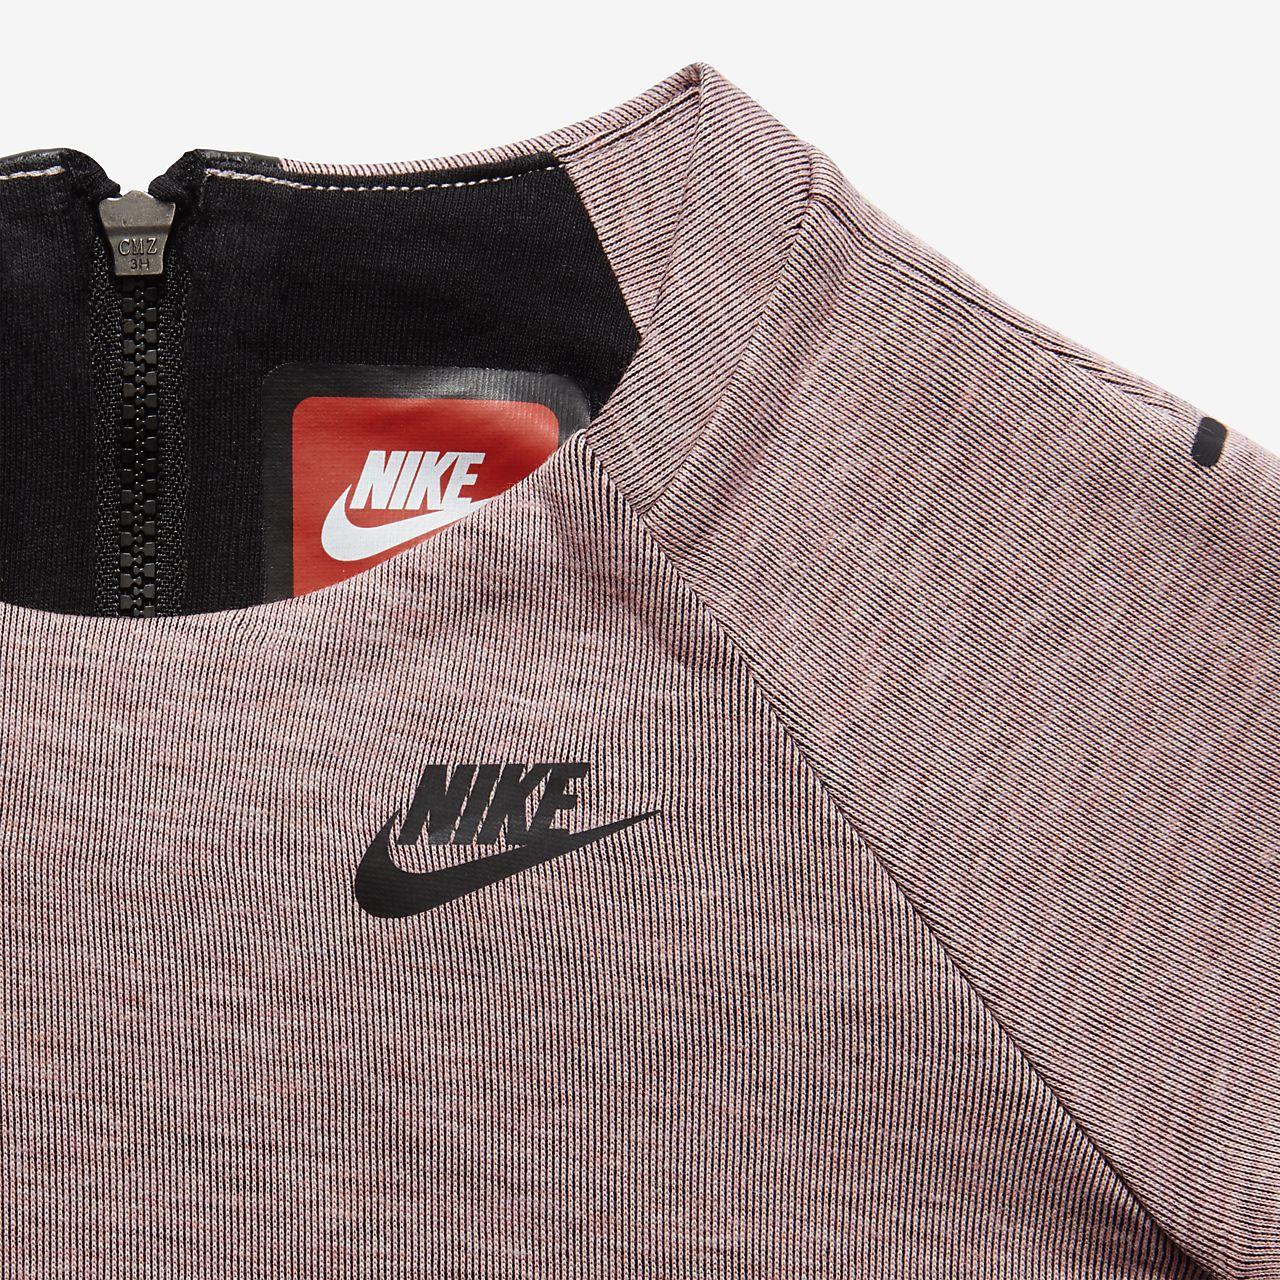 0564f5d87 Nike Tech Fleece Baby & Toddler Girls' Dress. Nike.com NL